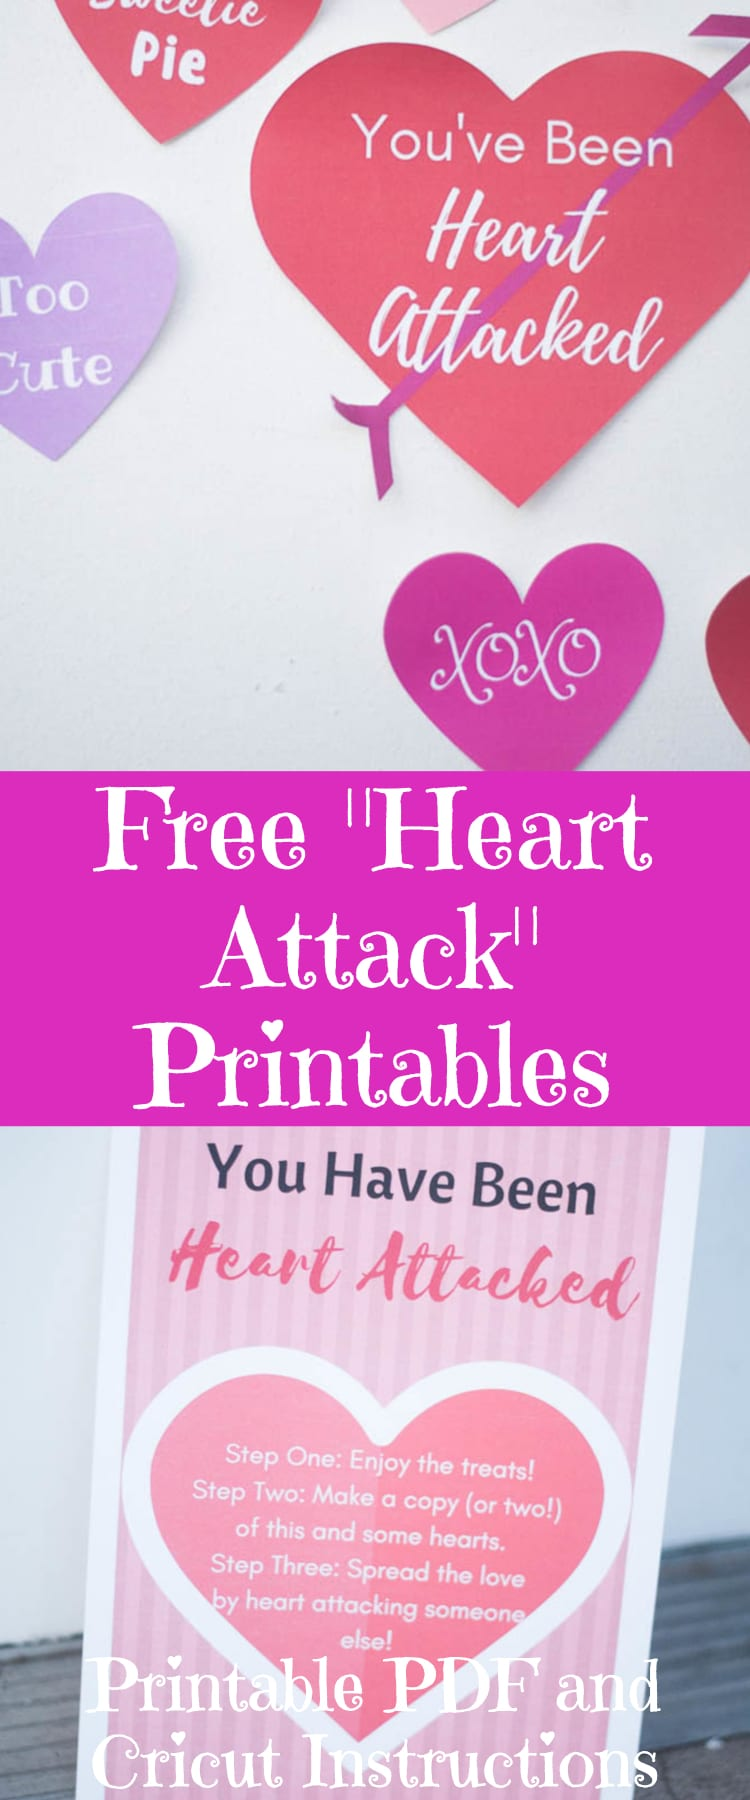 Free Heart Attack Printables / Valentine's Day Printable / Love Printables / Cricut Hearts / Cricut Valentine's Day via @clarkscondensed